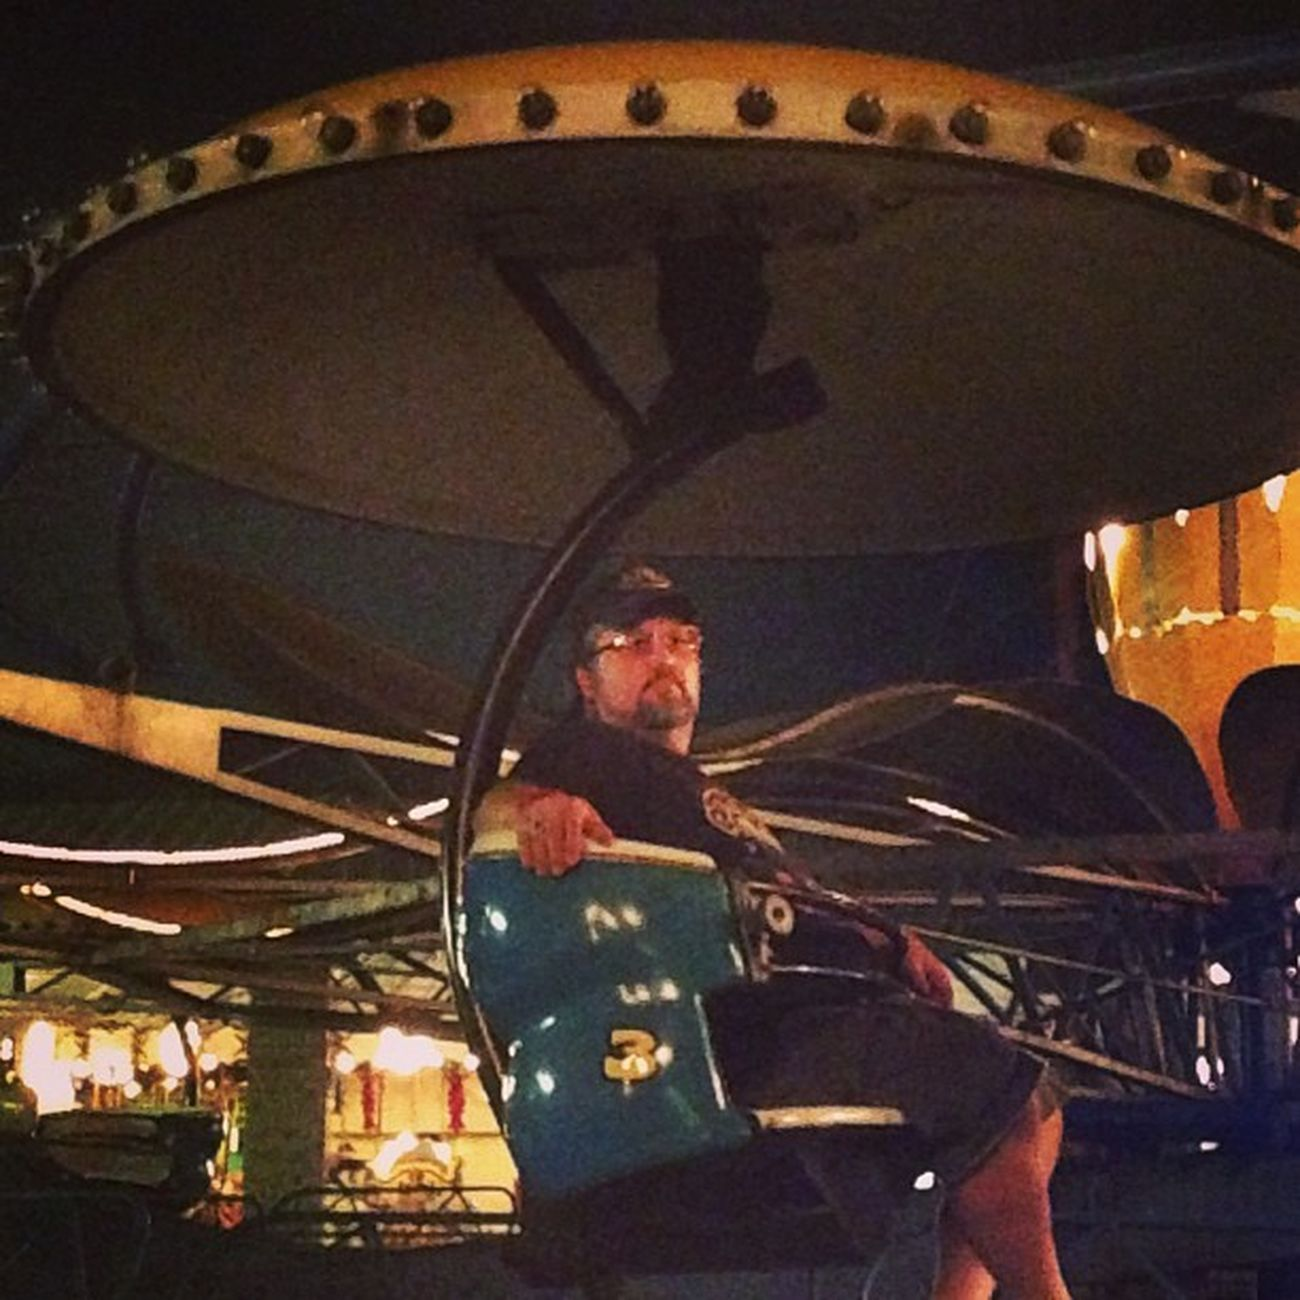 Jk chillin on the Paratrooper . Camdenpark Waynecountyfair